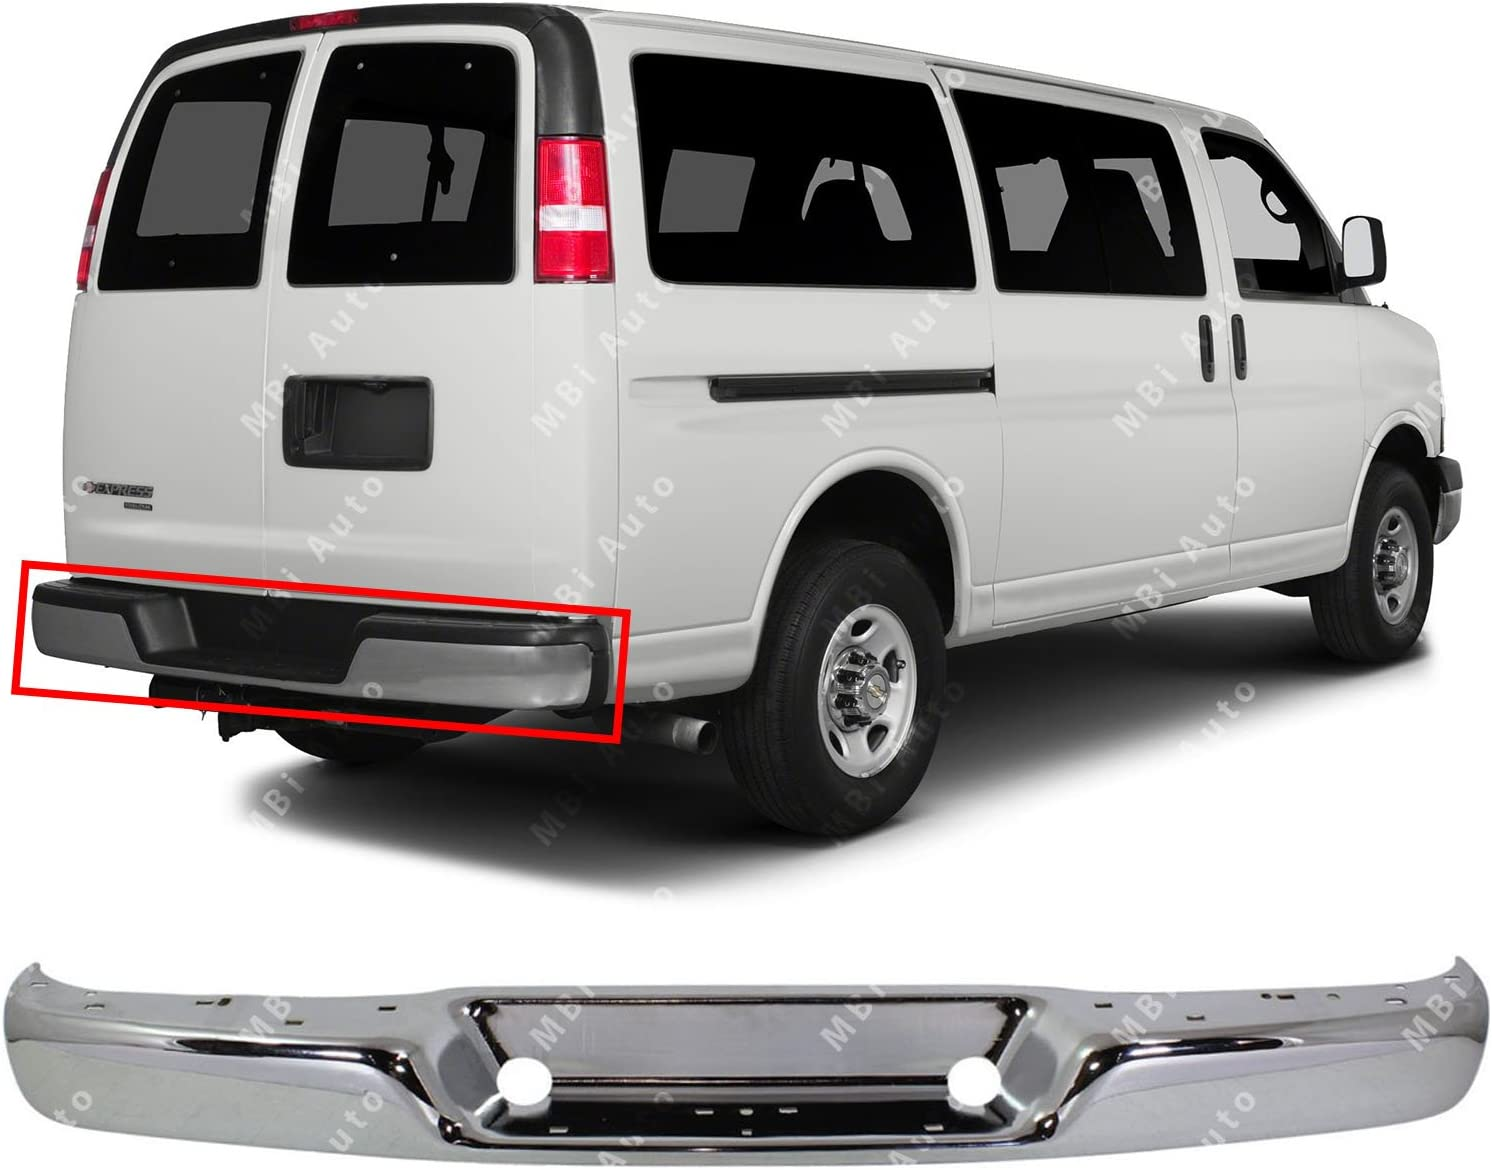 MBI AUTO Rear Bumper Face Bar Shell for 1996-2018 Chevy Express /& GMC Savana Van 96-17 GM1102397 Chrome Steel